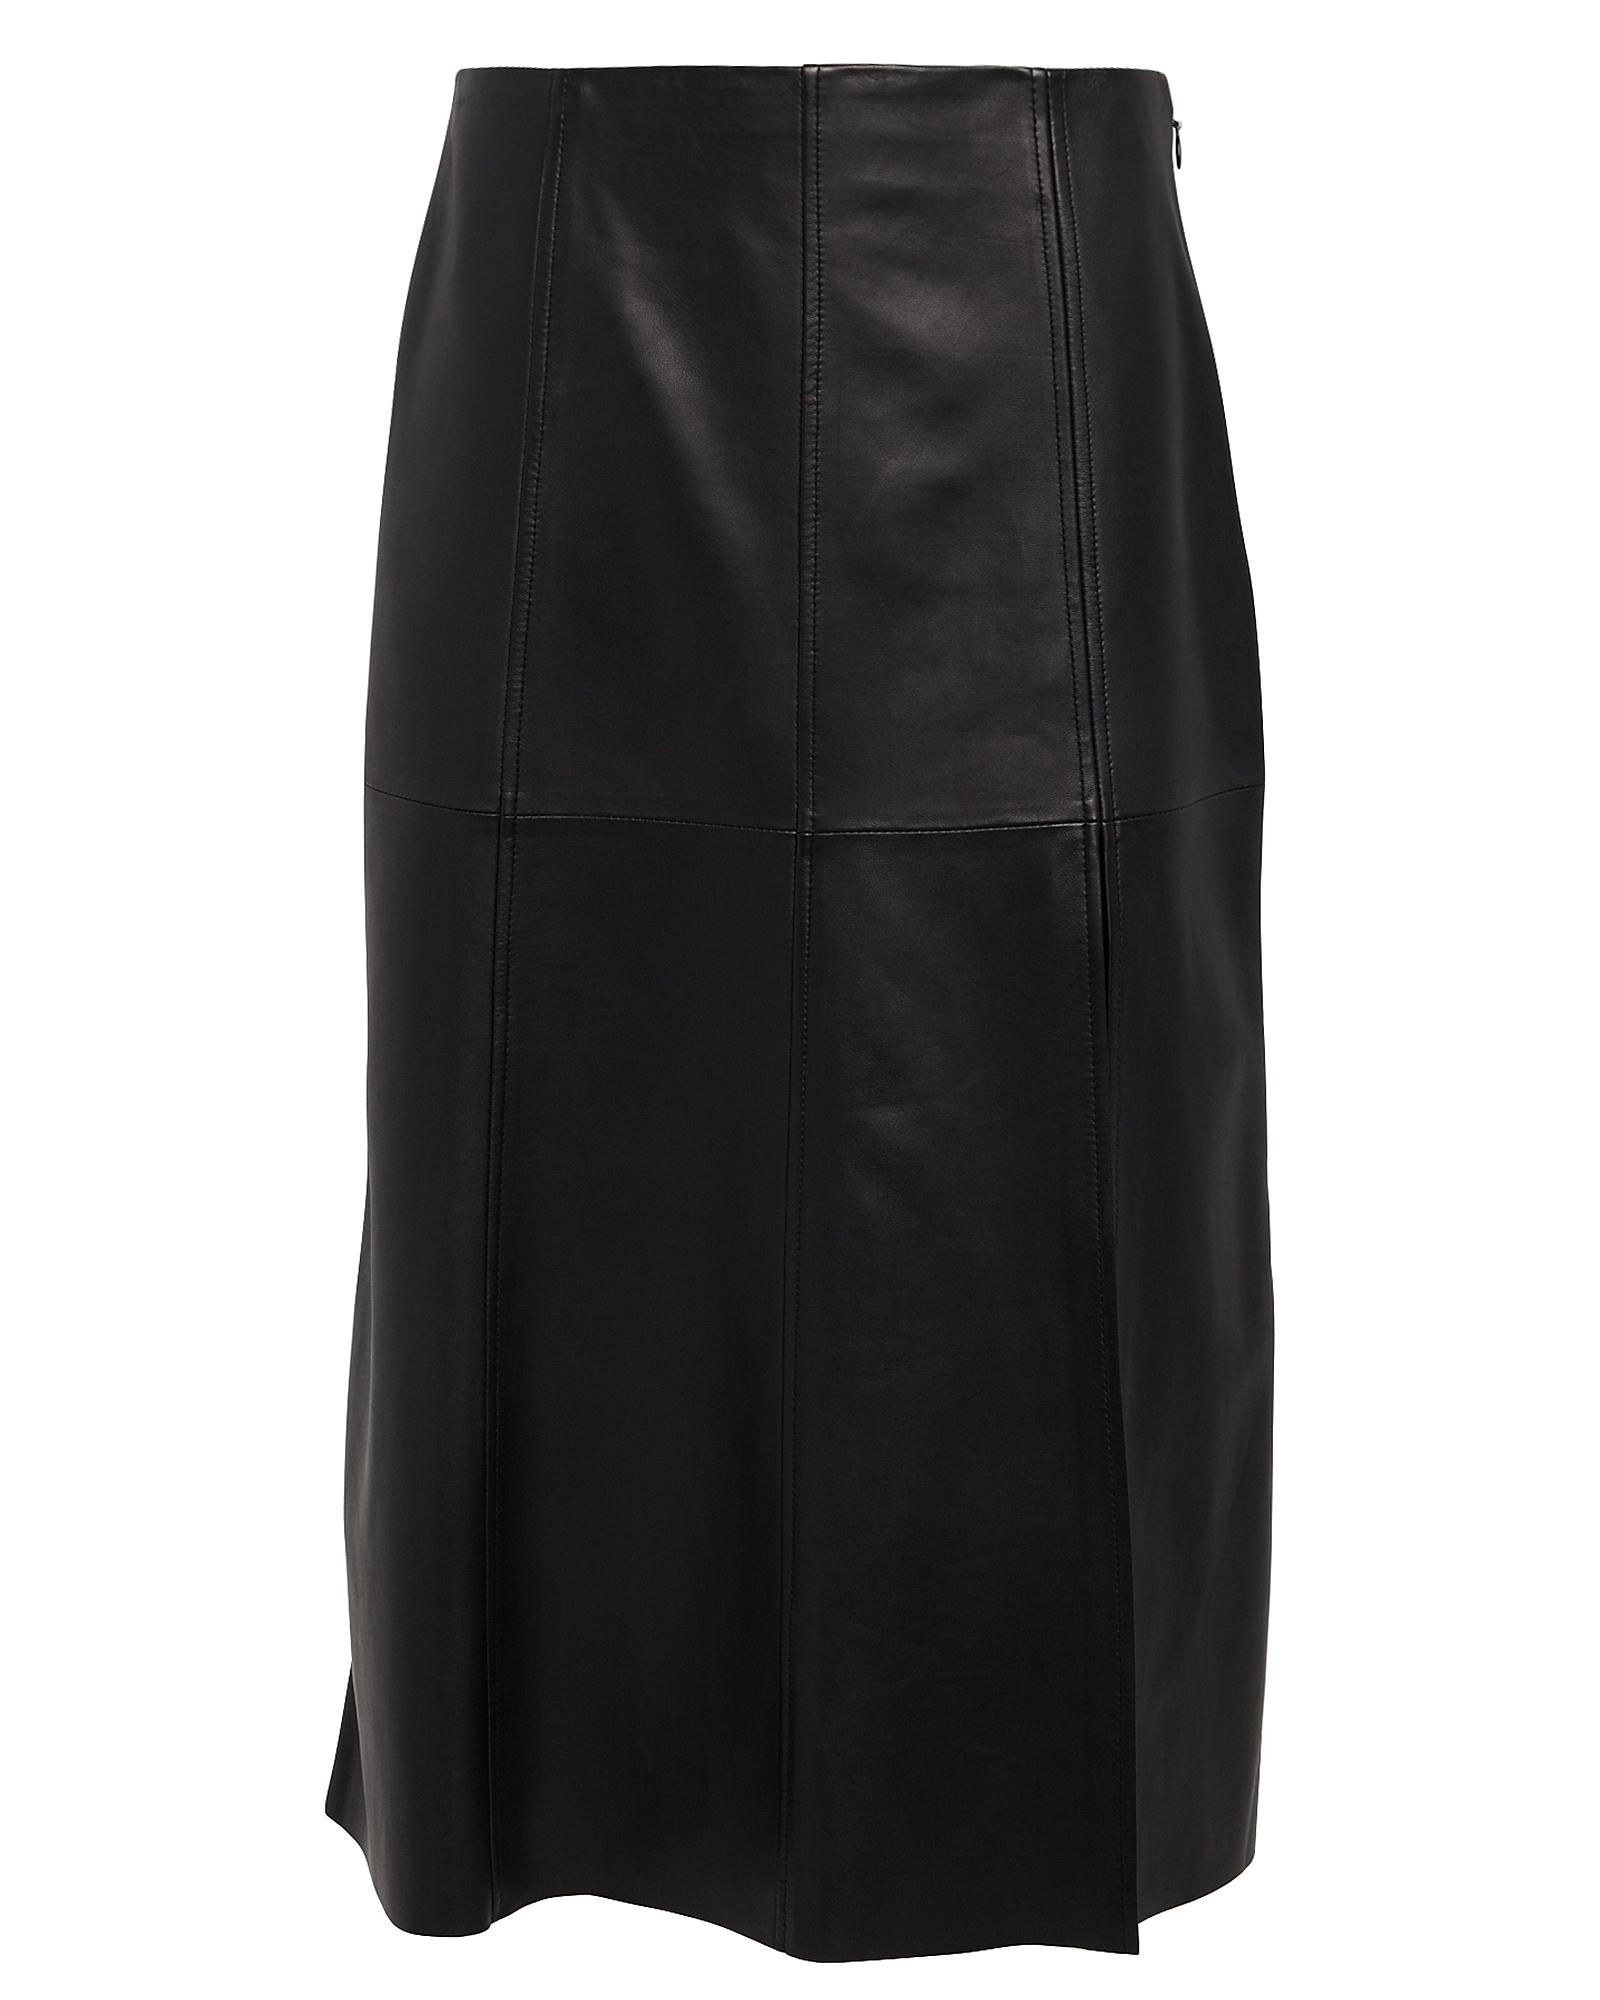 Paneled Leather Midi Skirt by Intermix